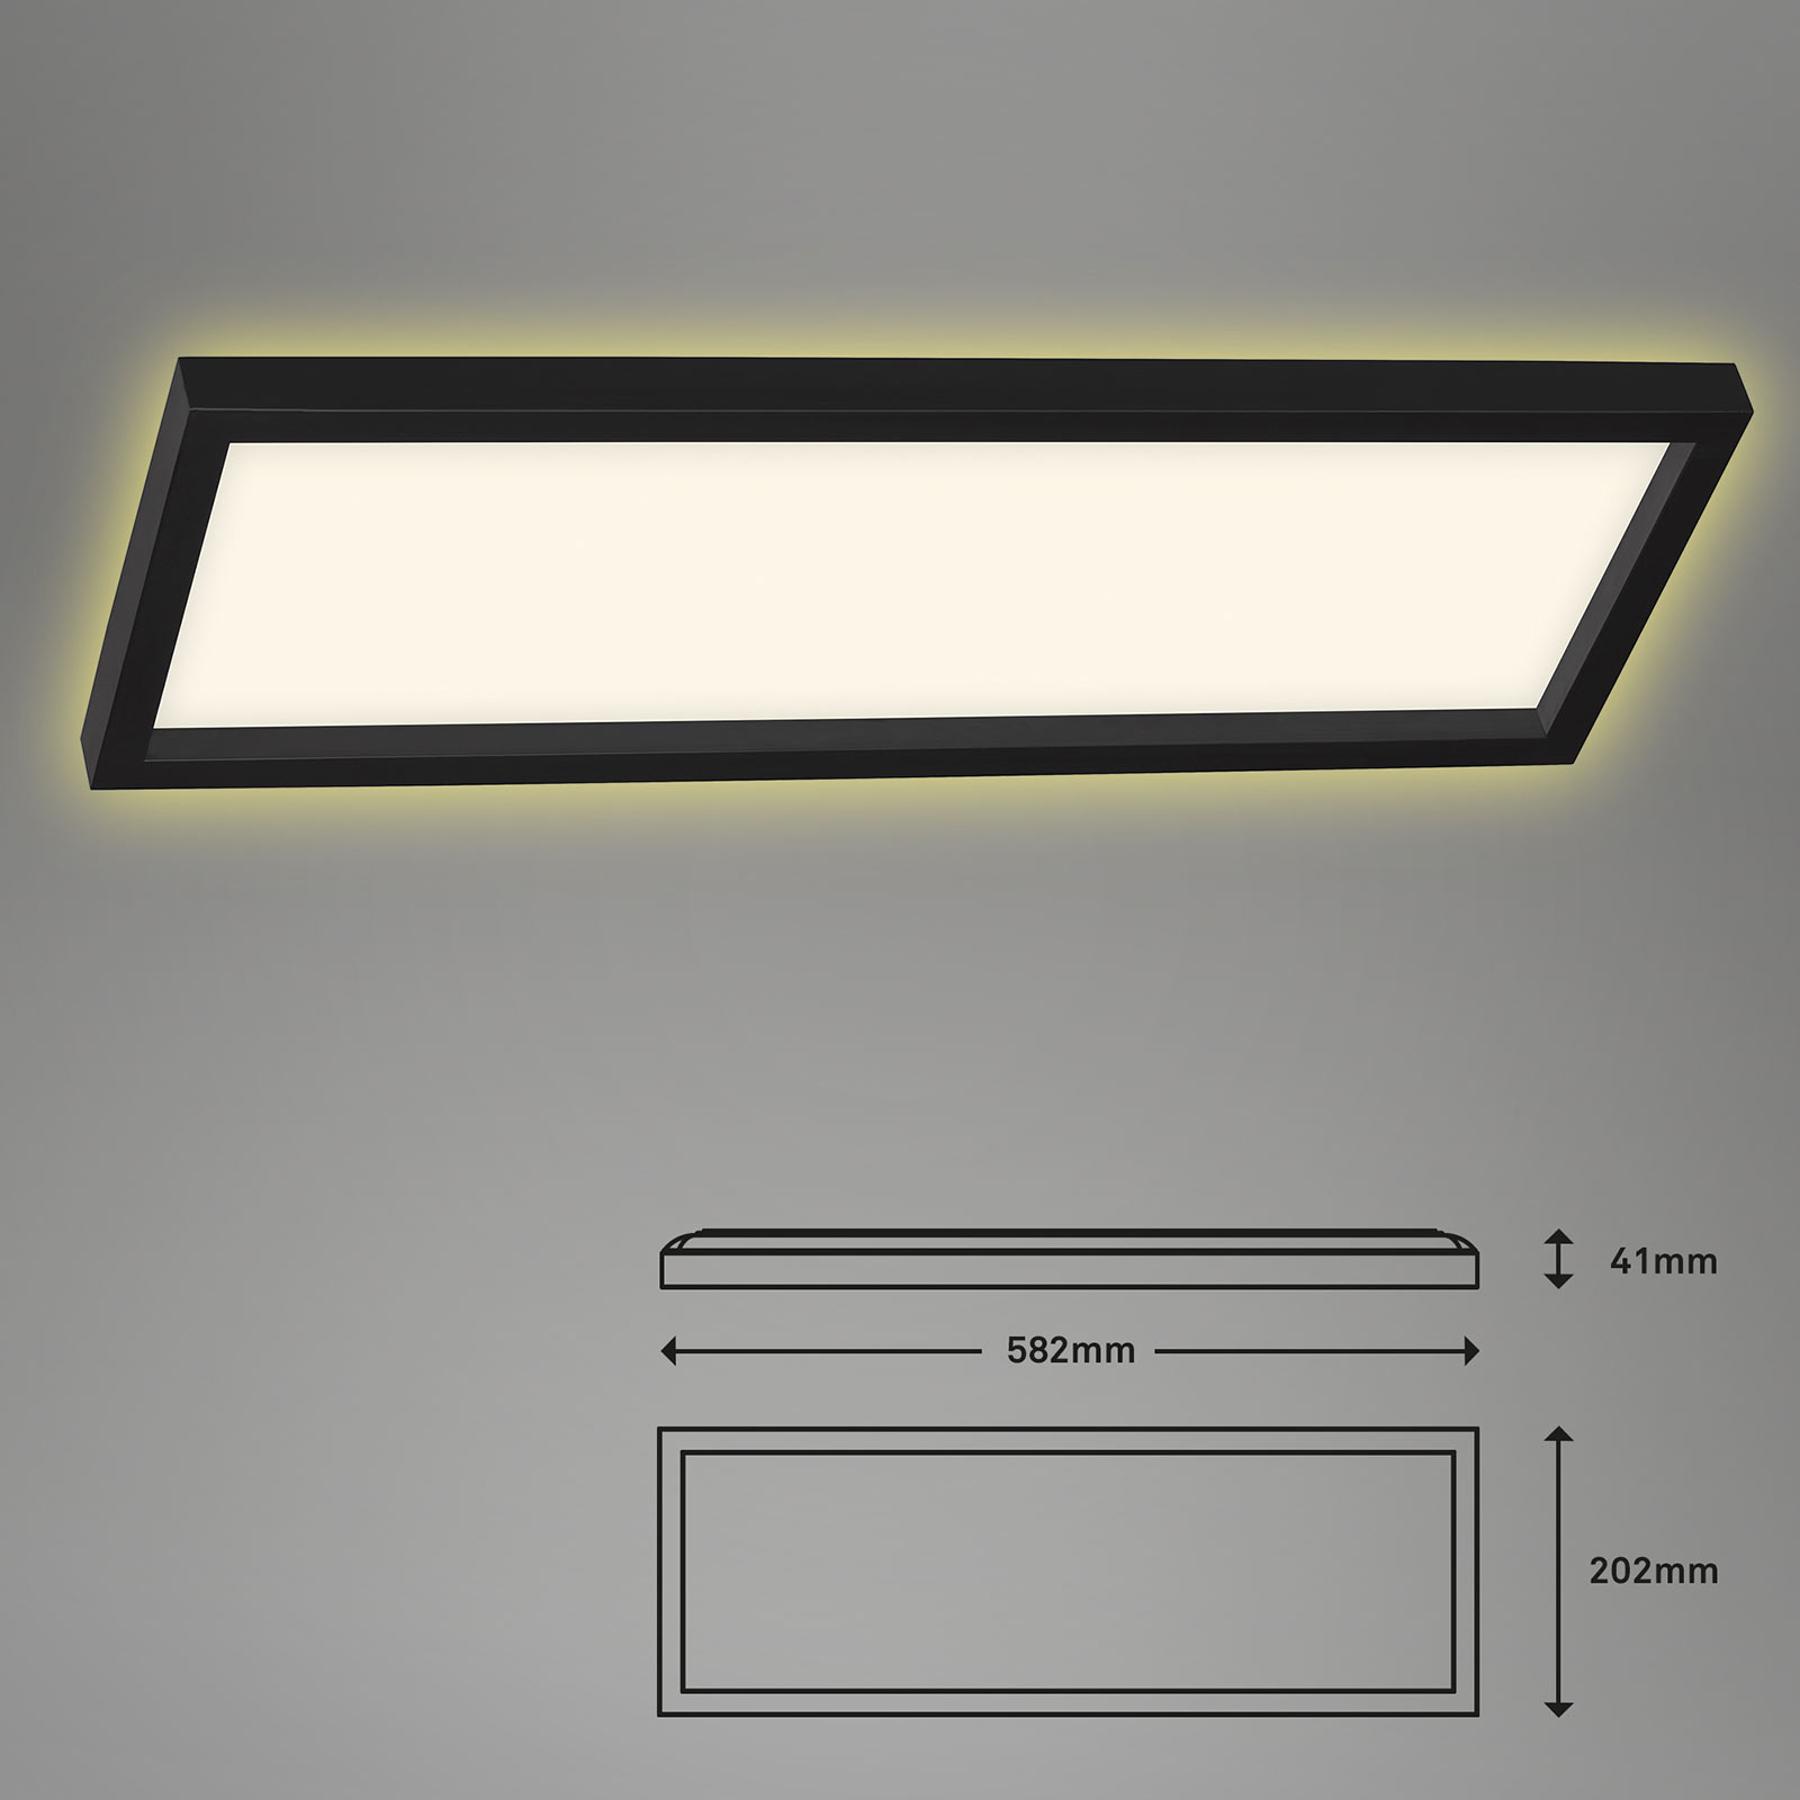 LED plafondlamp 7365, 58 x 20 cm, zwart